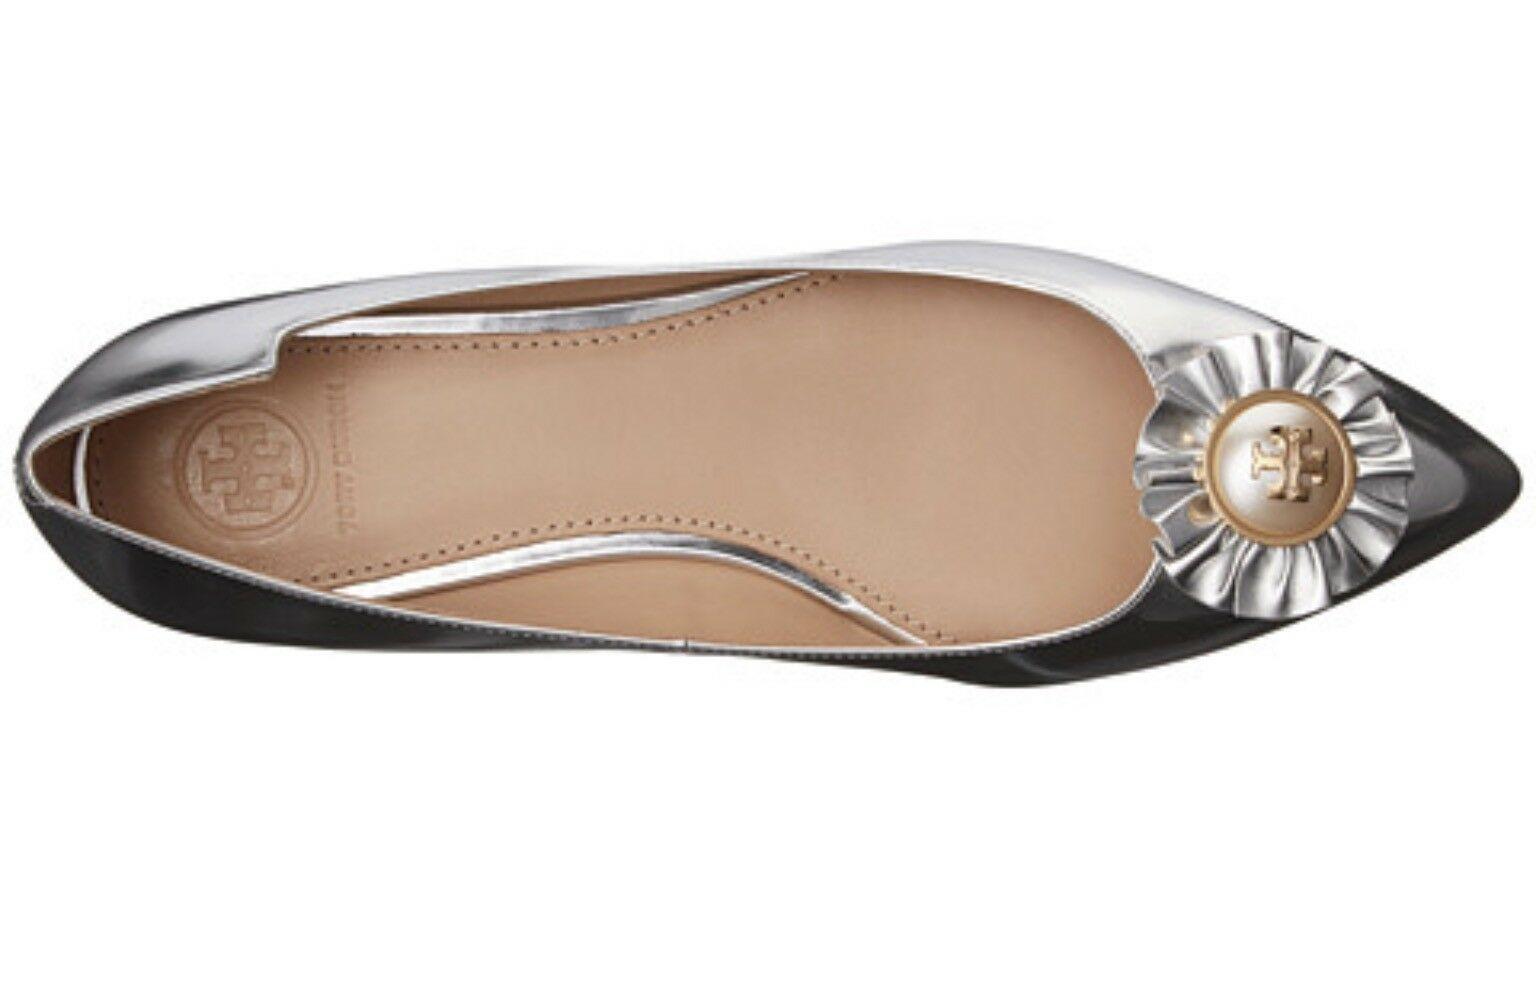 Tory Burch Melody Metallic Leather Flats Retail: $265